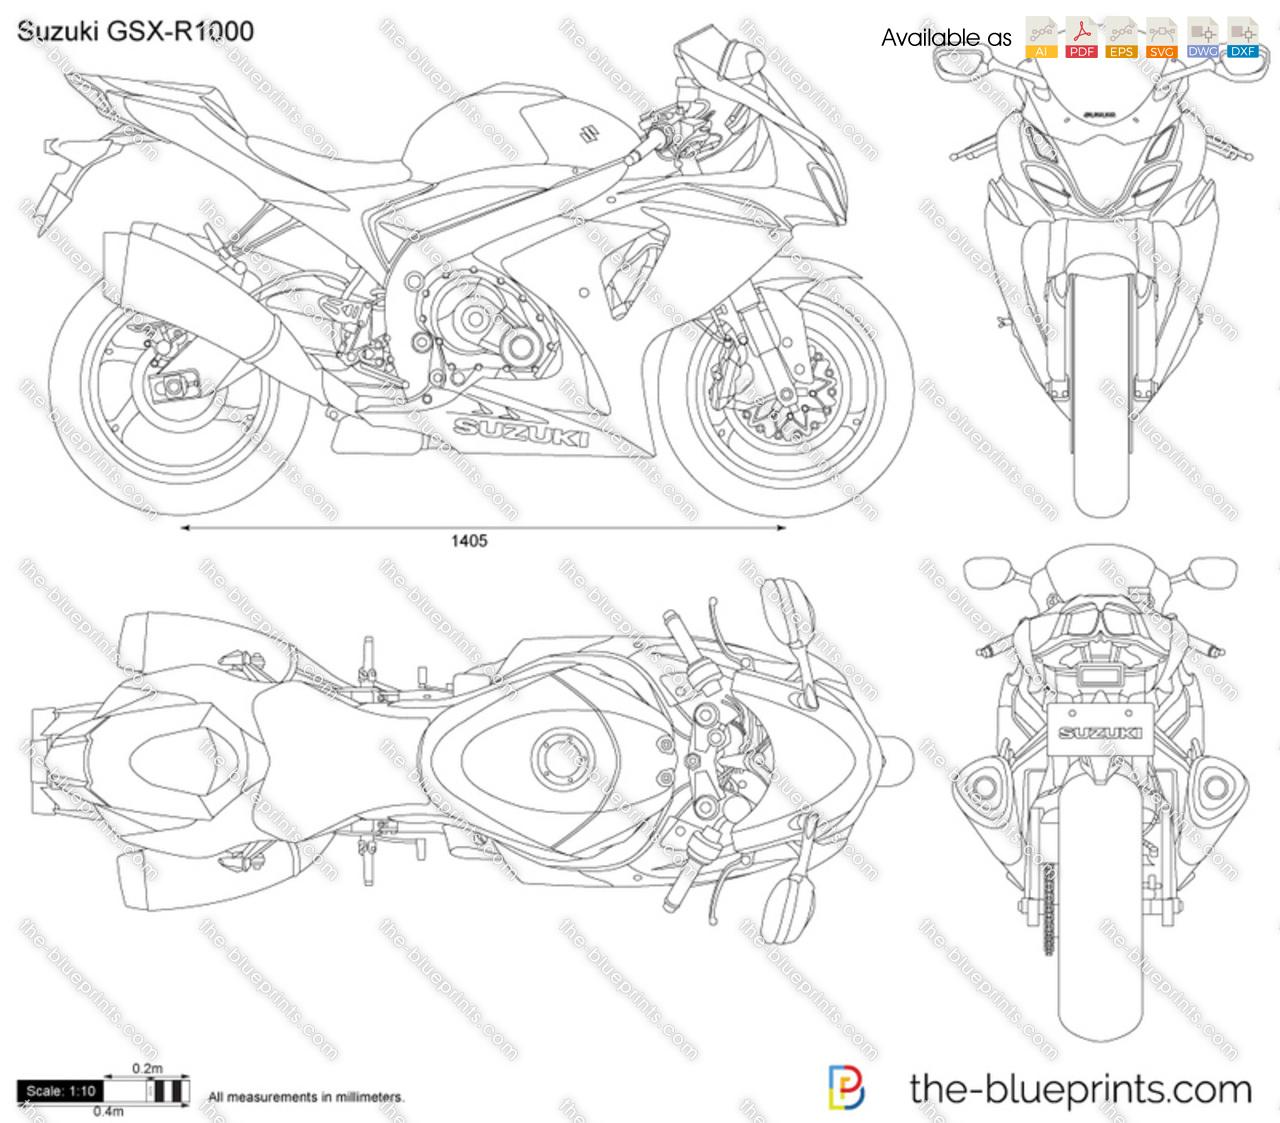 Suzuki GSX-R1000 vector drawing